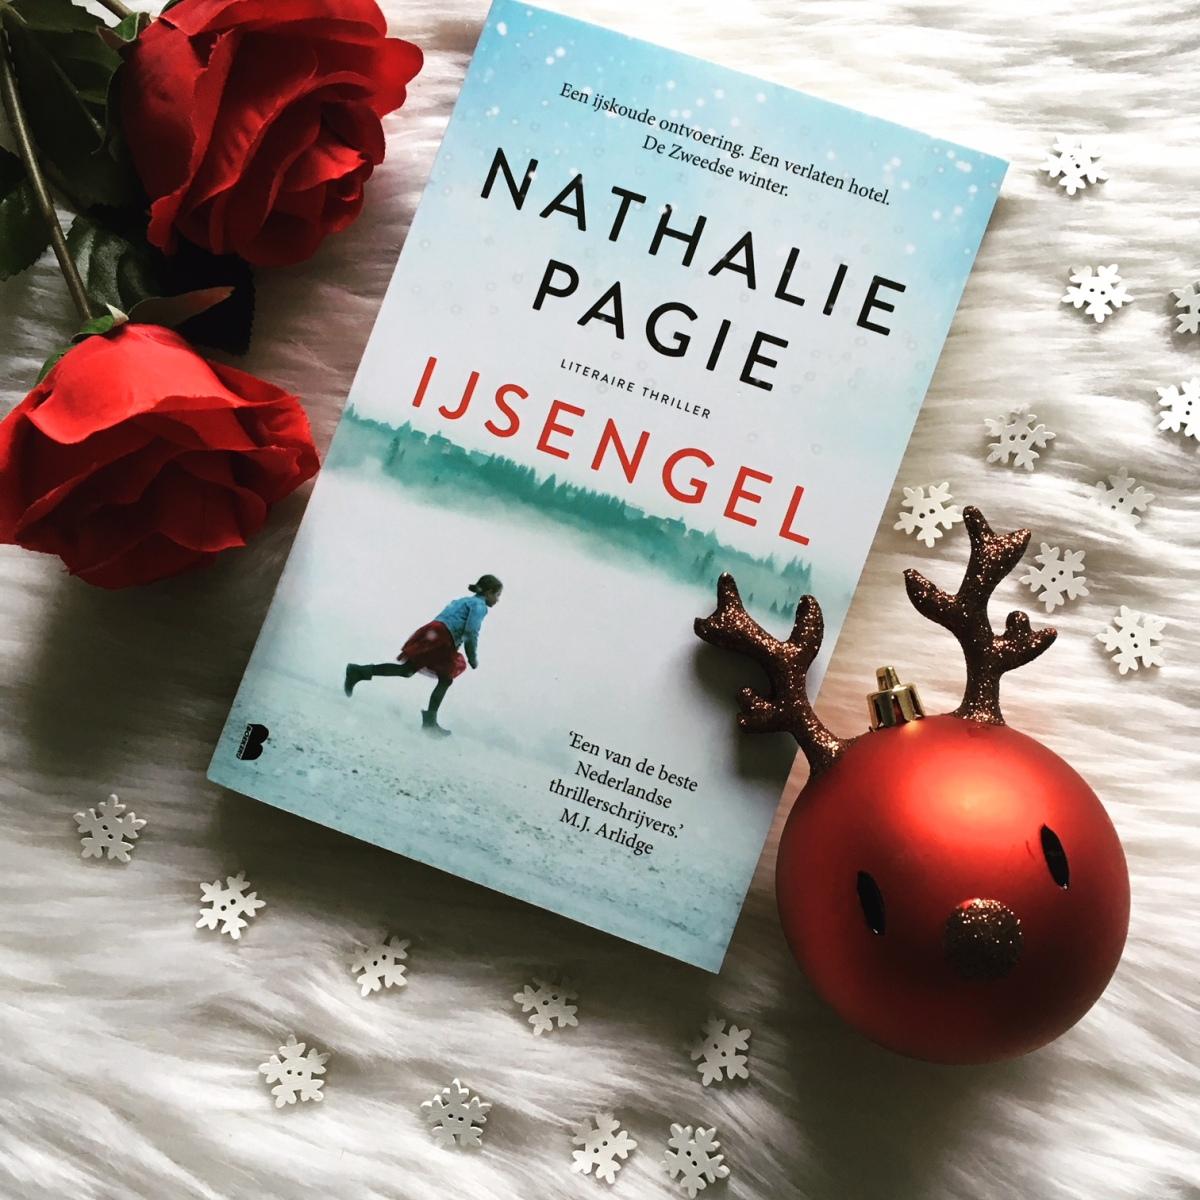 IJsengel – NathaliePagie